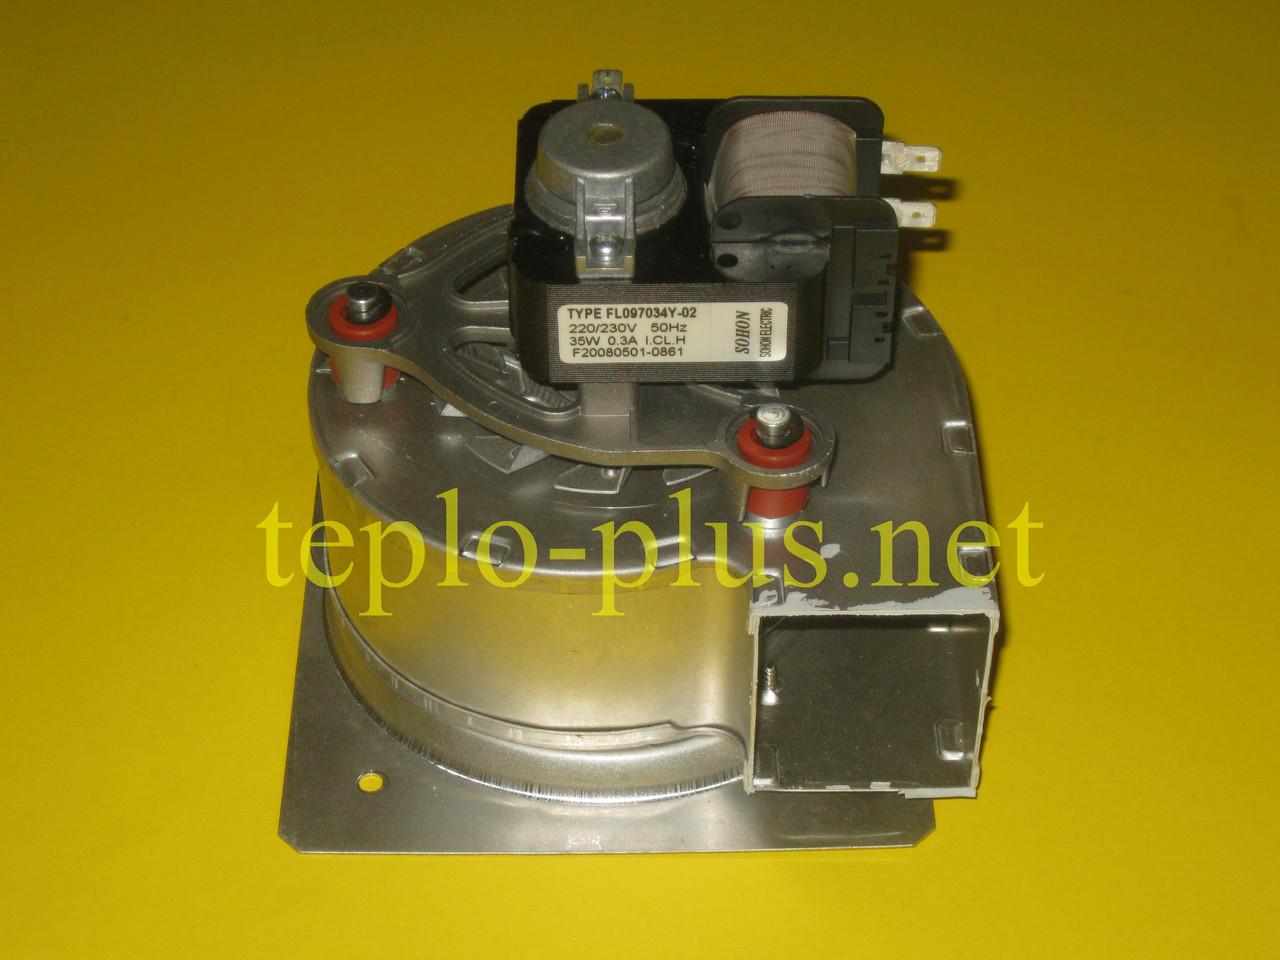 Вентилятор DM.85 AA10020002 Zoom Boilers Project 18 BF, Expert 18 BF, Master 18 BF, Rens 18 BF, фото 3